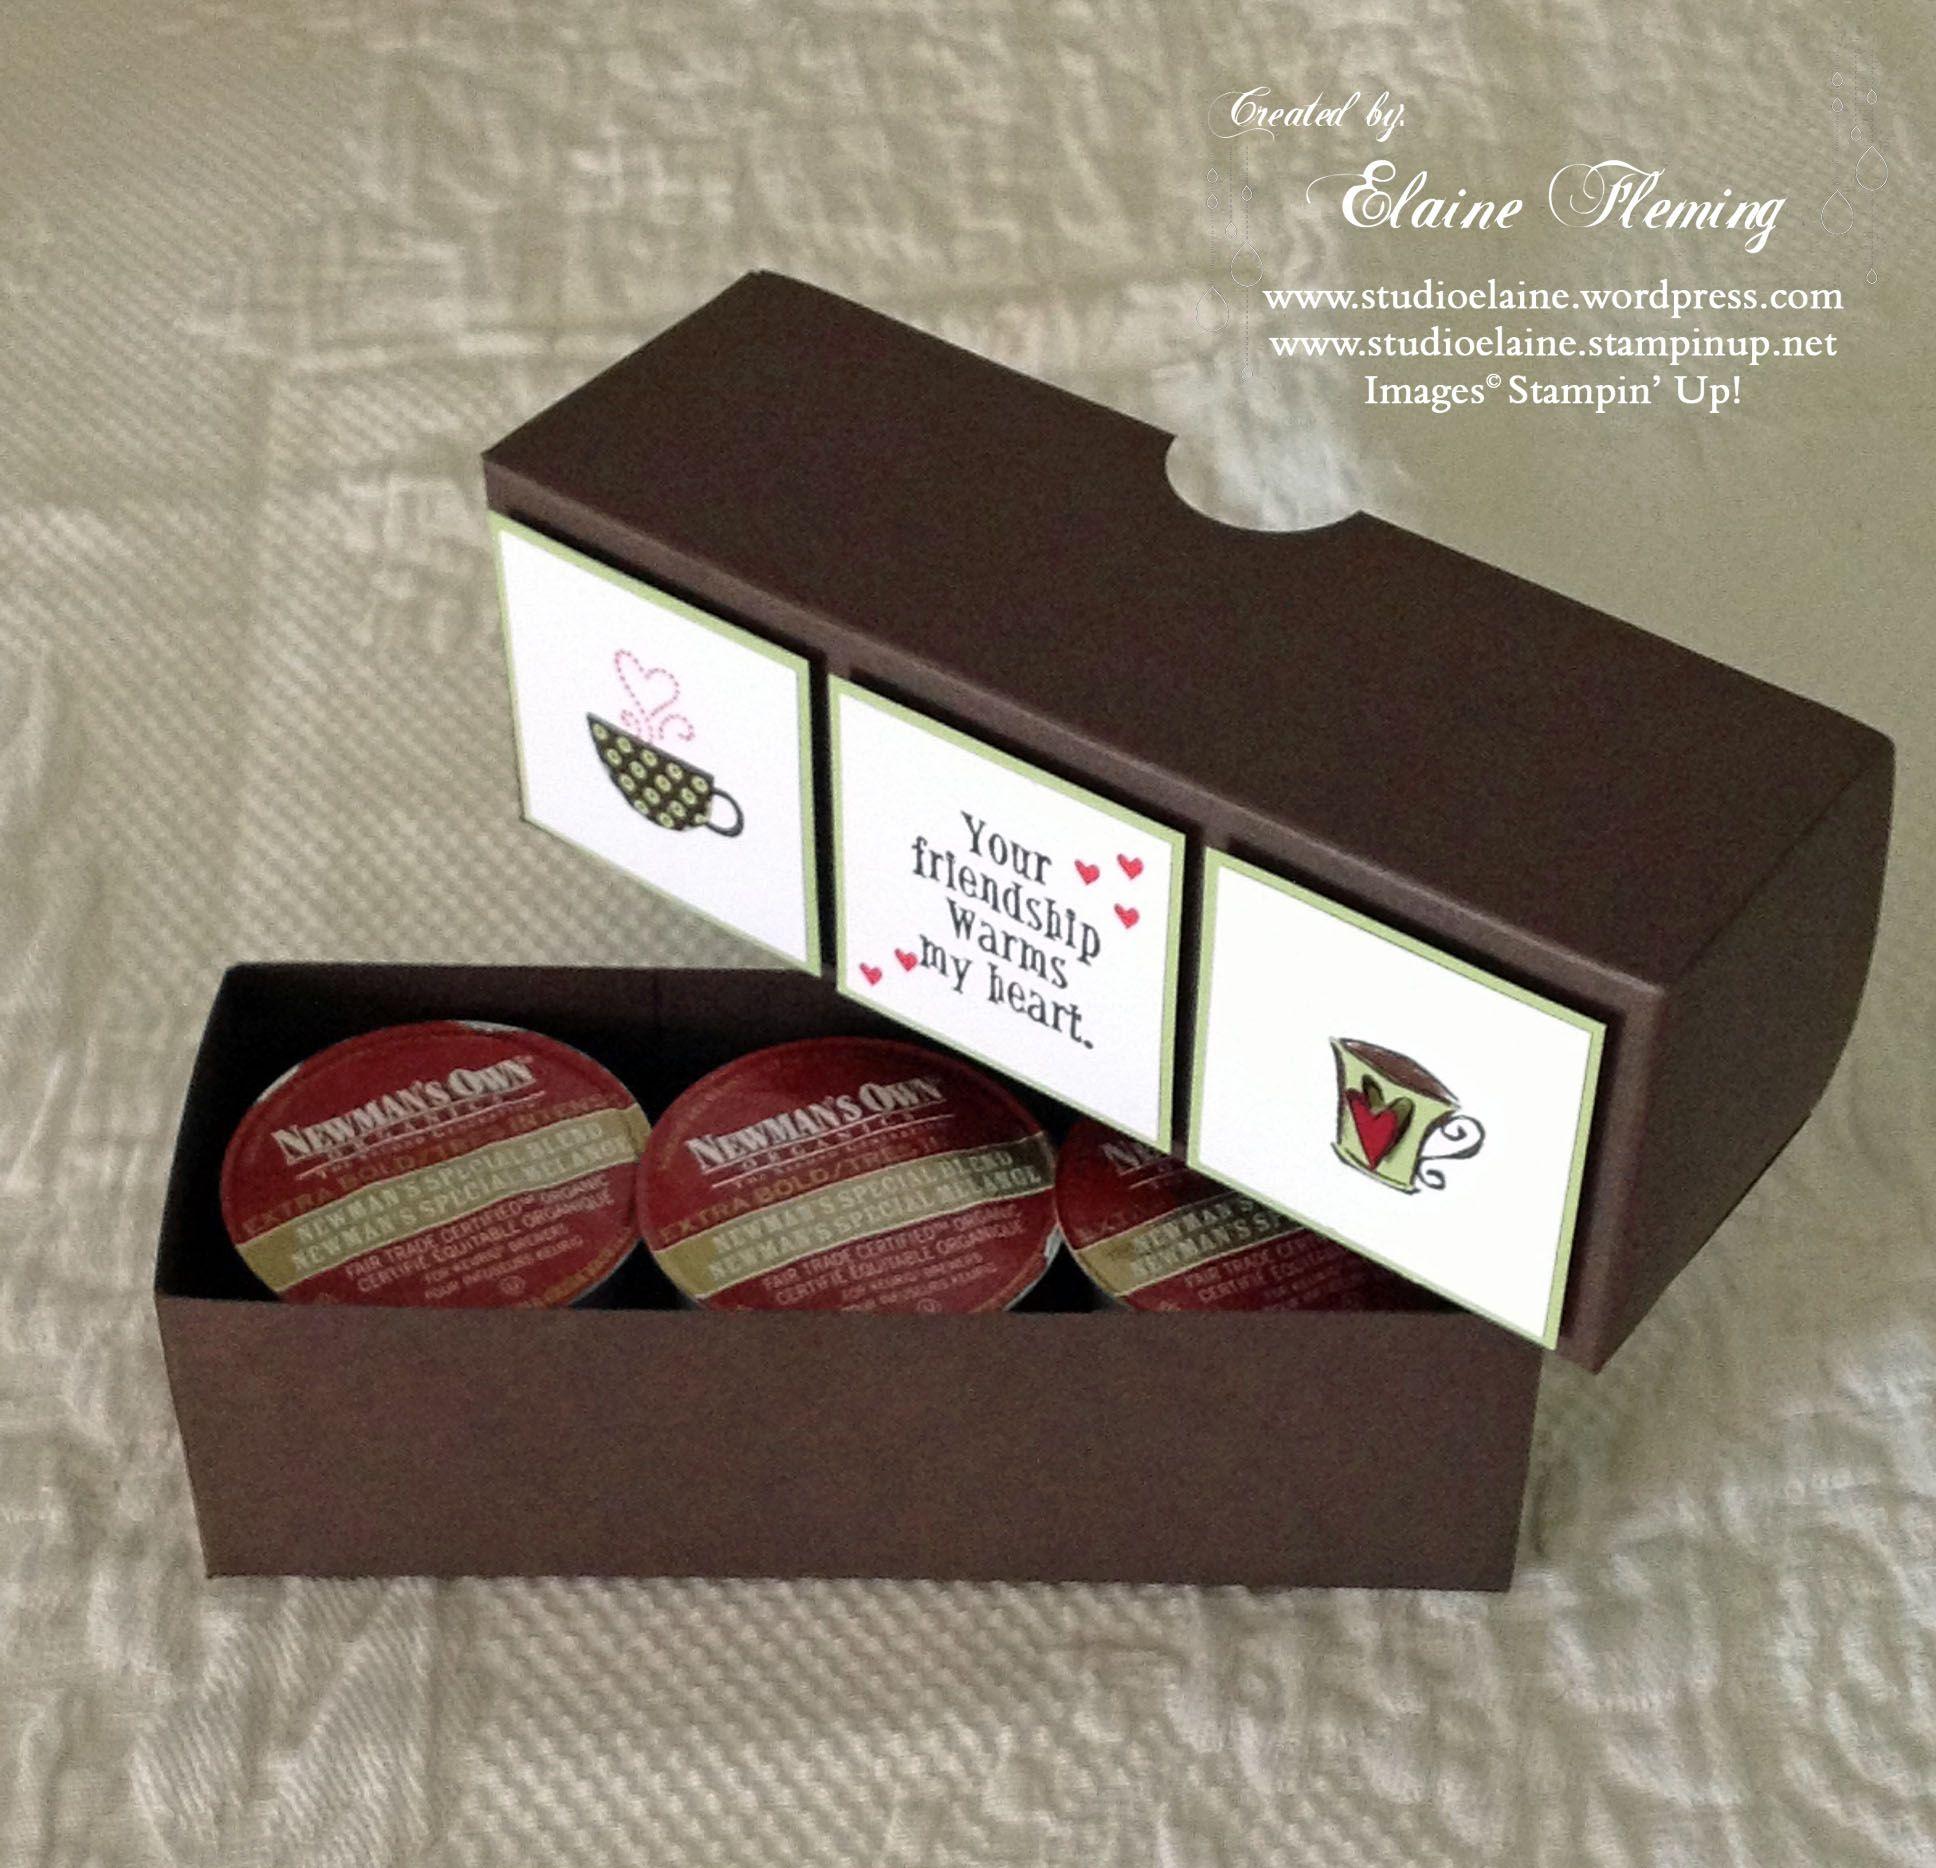 K Cup Box Your Friendship Warms My Heart Handmade Box Coffee Cards Box